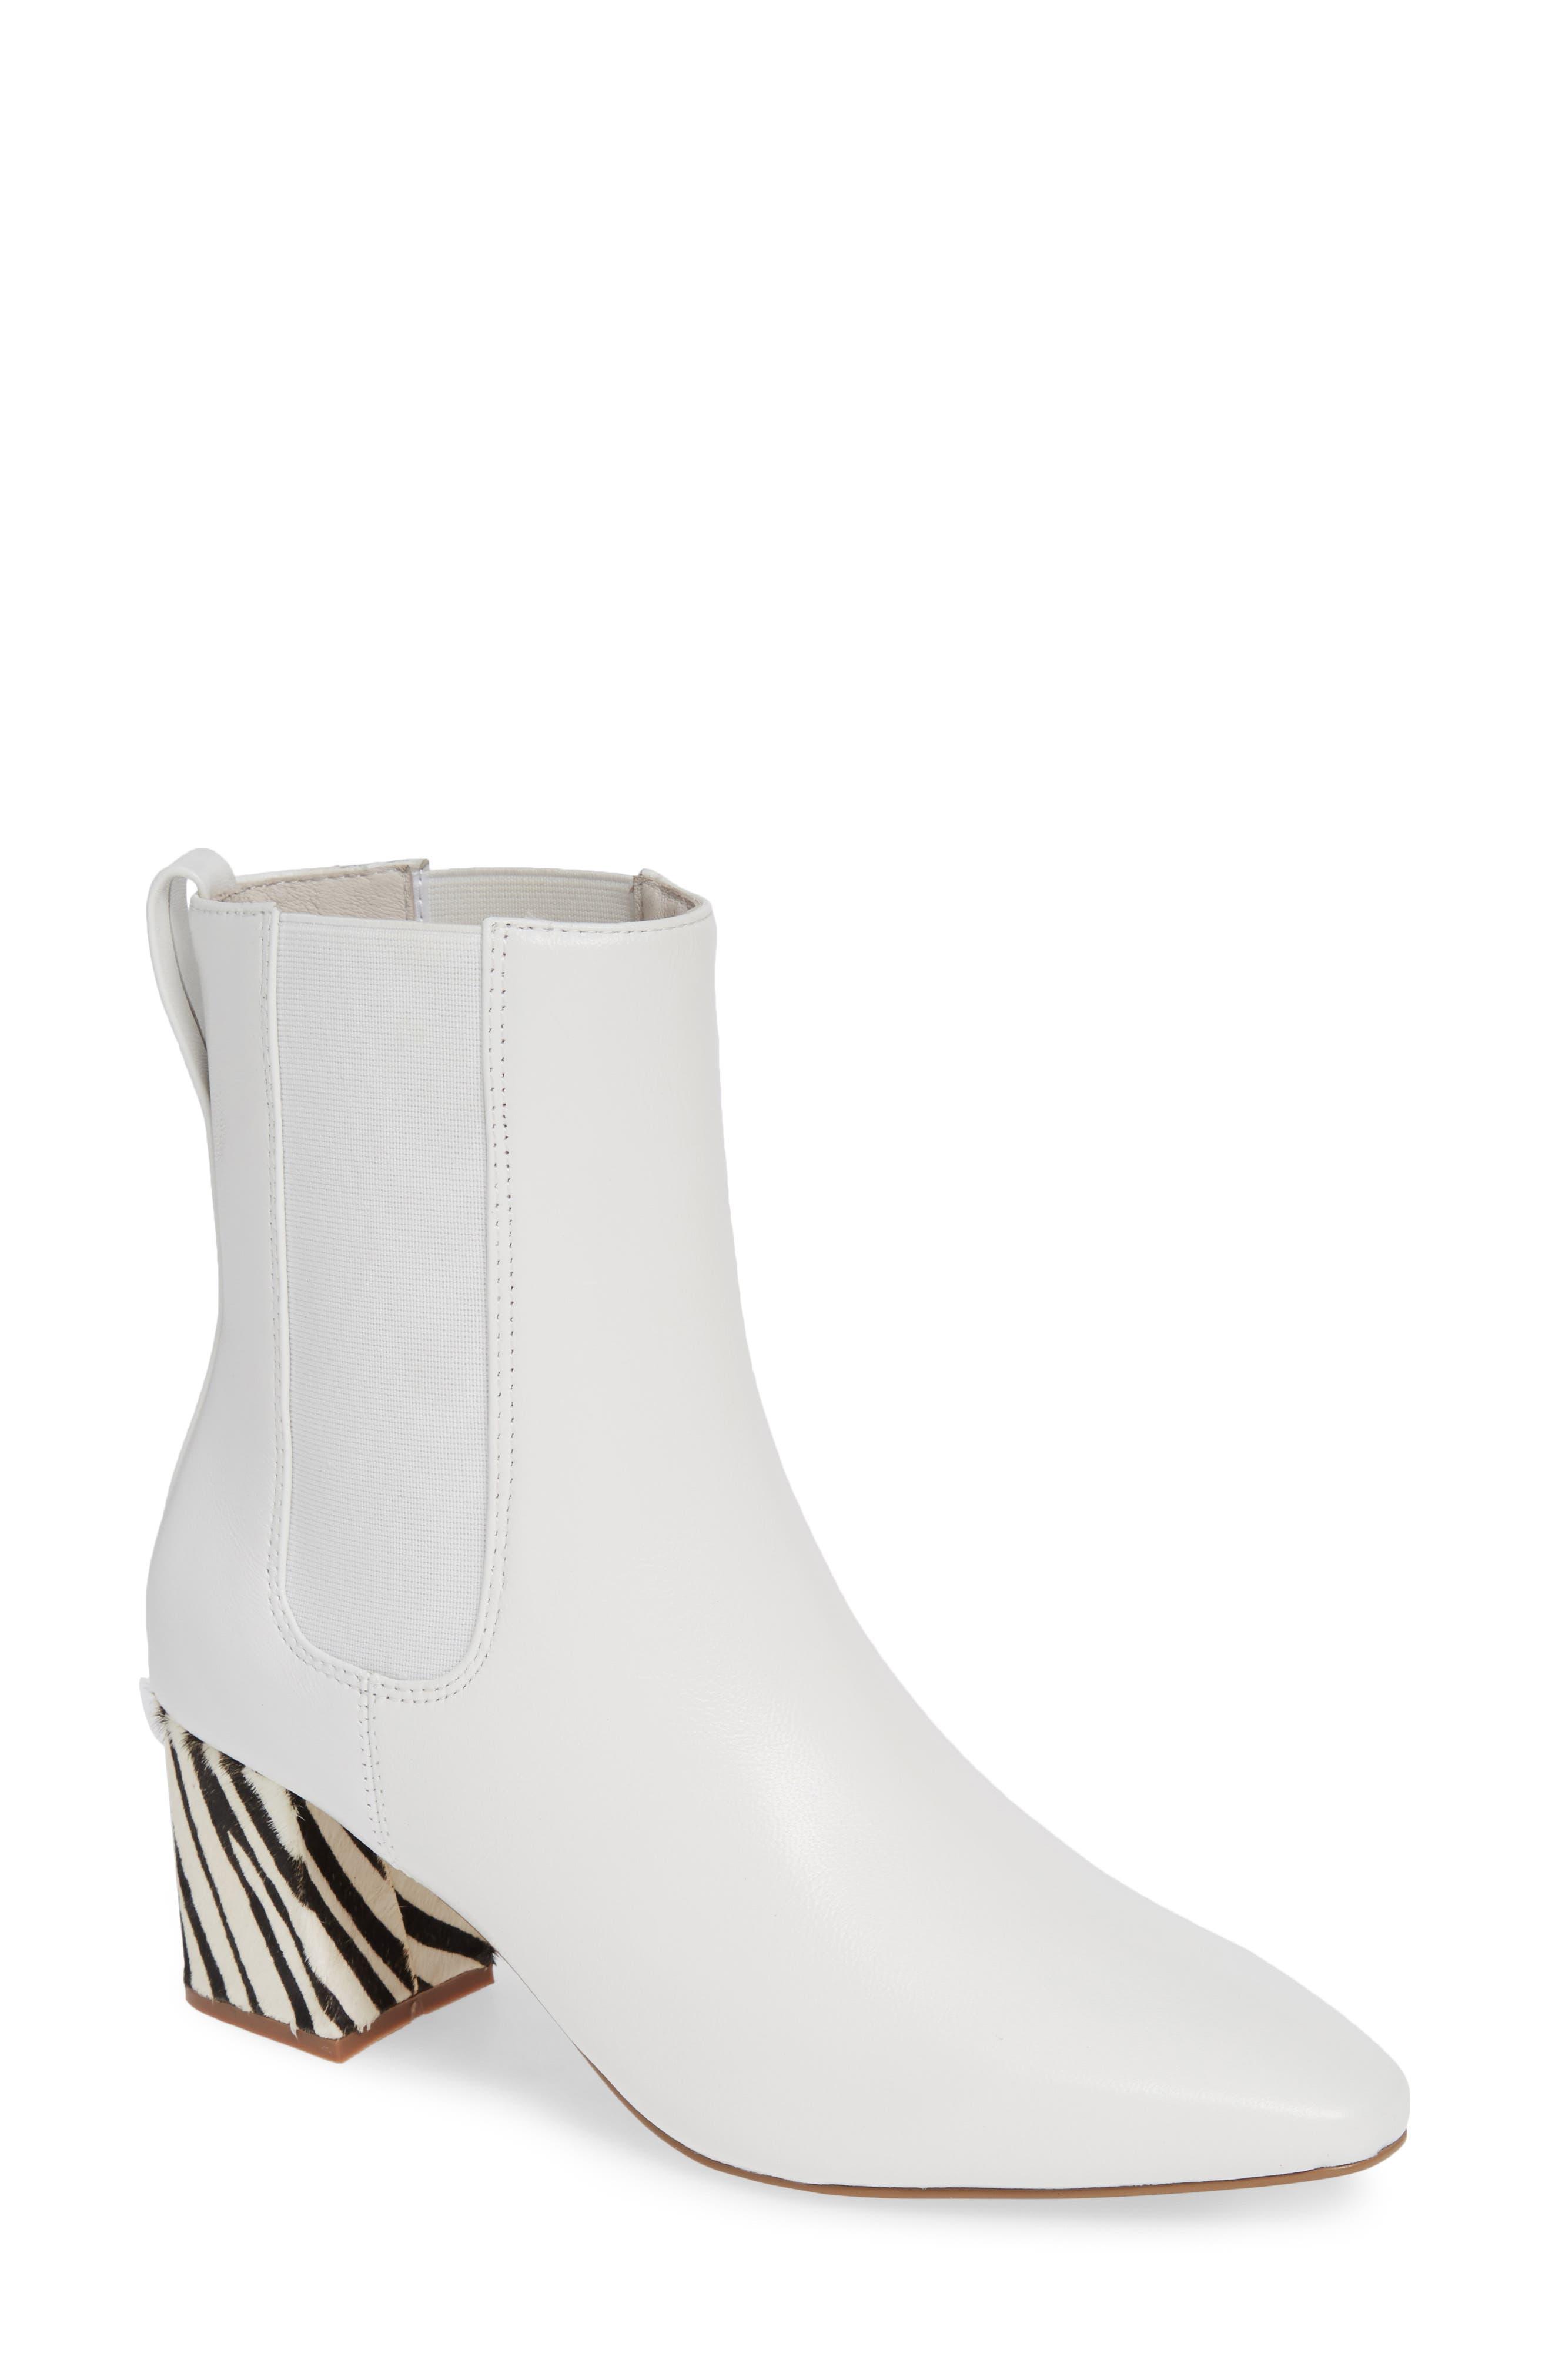 Matisse Off Duty Genuine Calf Hair Chelsea Bootie, White